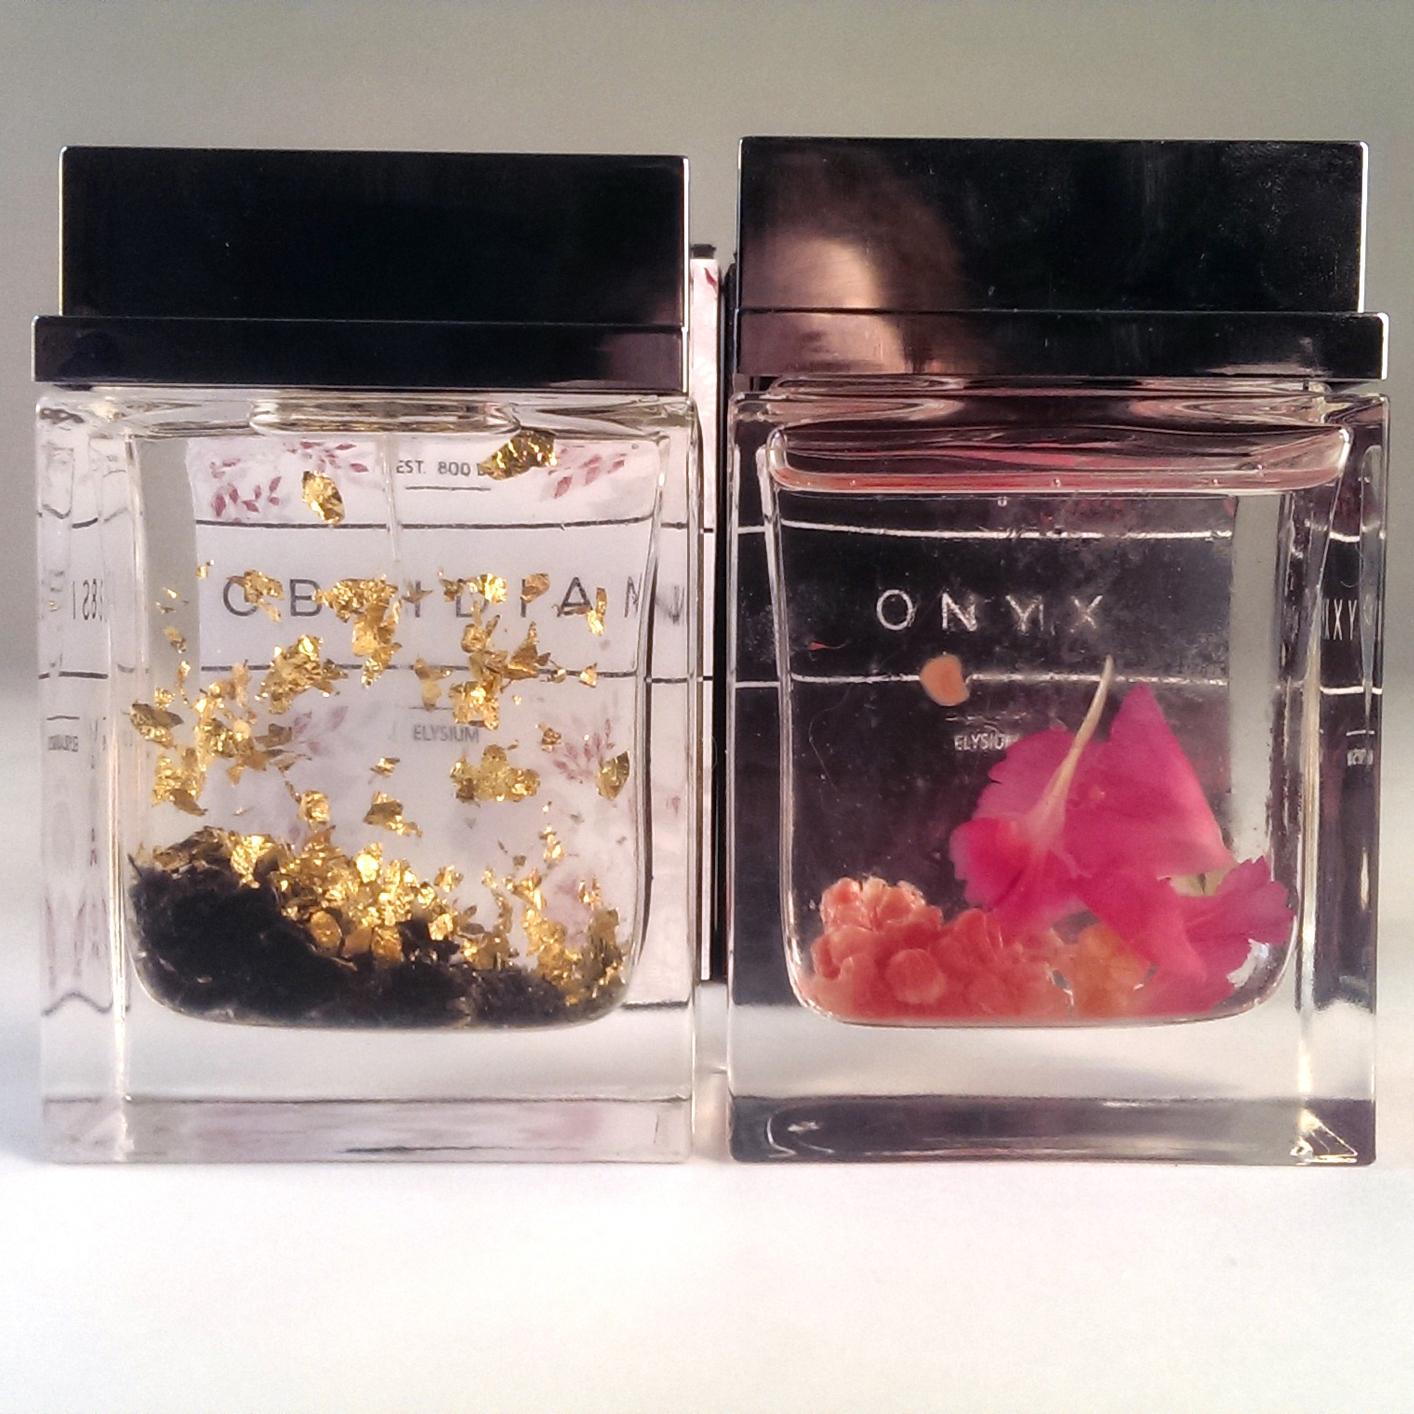 Obsidian & Onyx, His&Hers Perfume